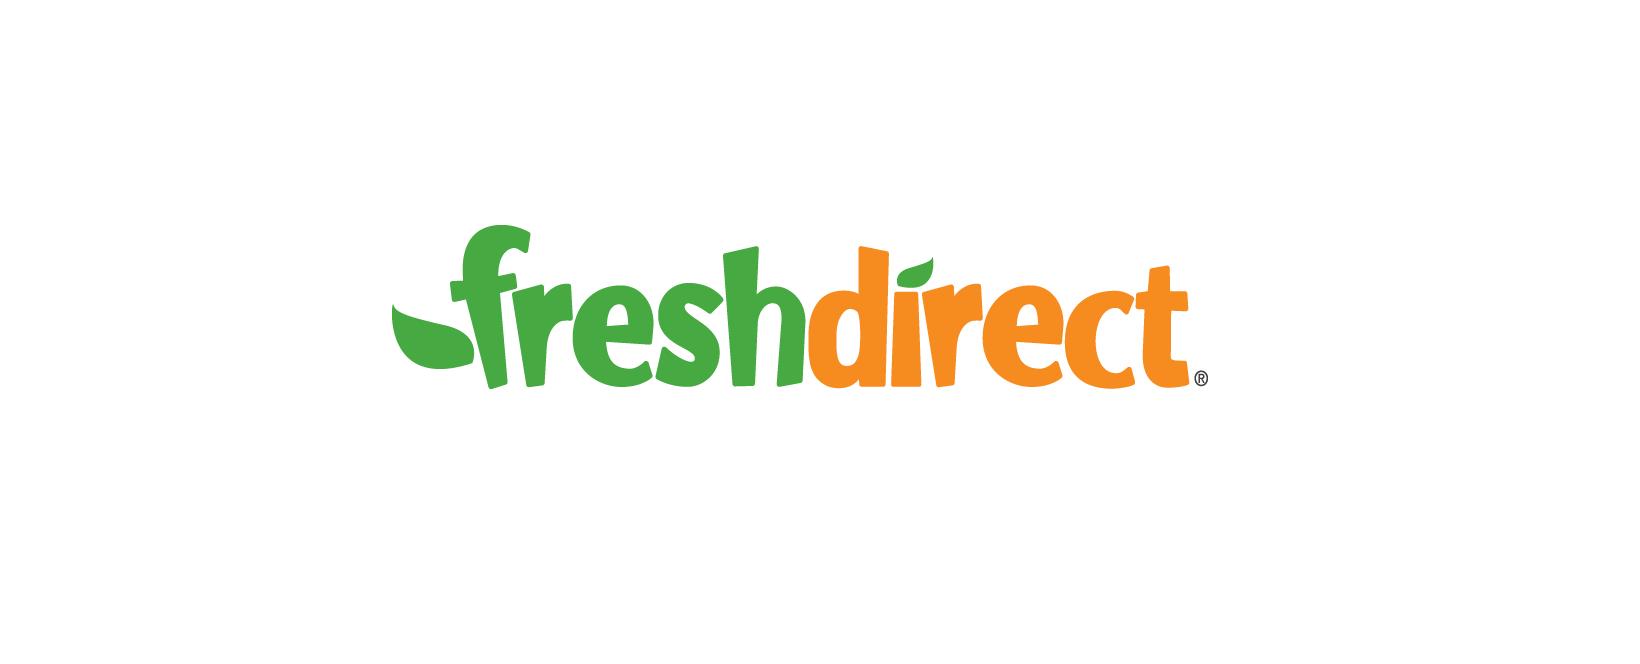 FreshDirect Coupon Code 2021